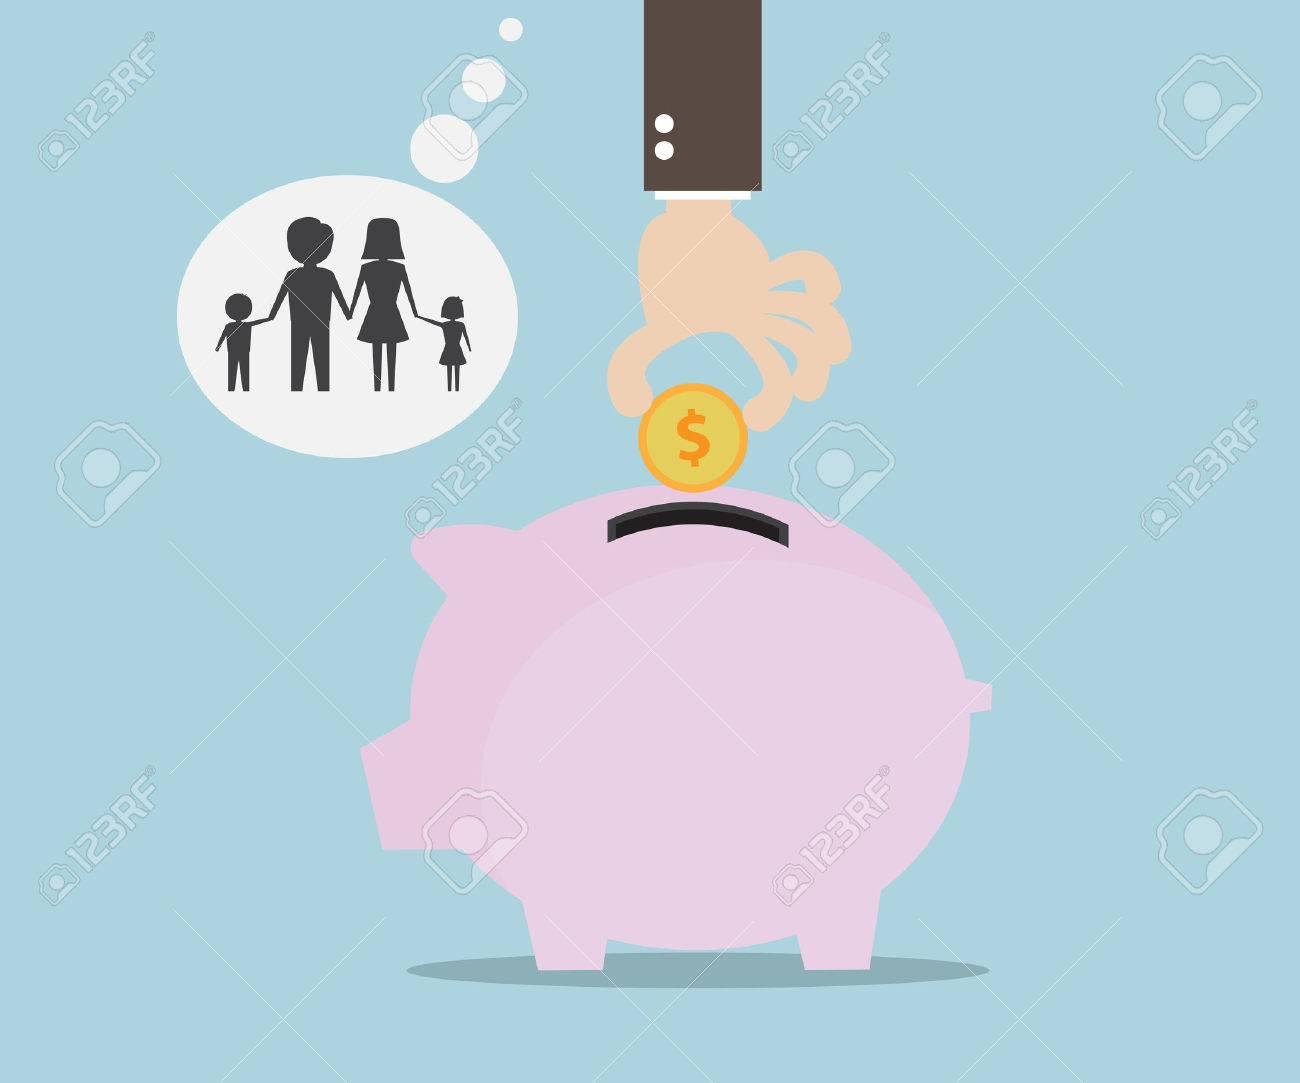 Hand Saving Money for Family, Money Saving Concept Flat Design Vector Illustration - 54305743